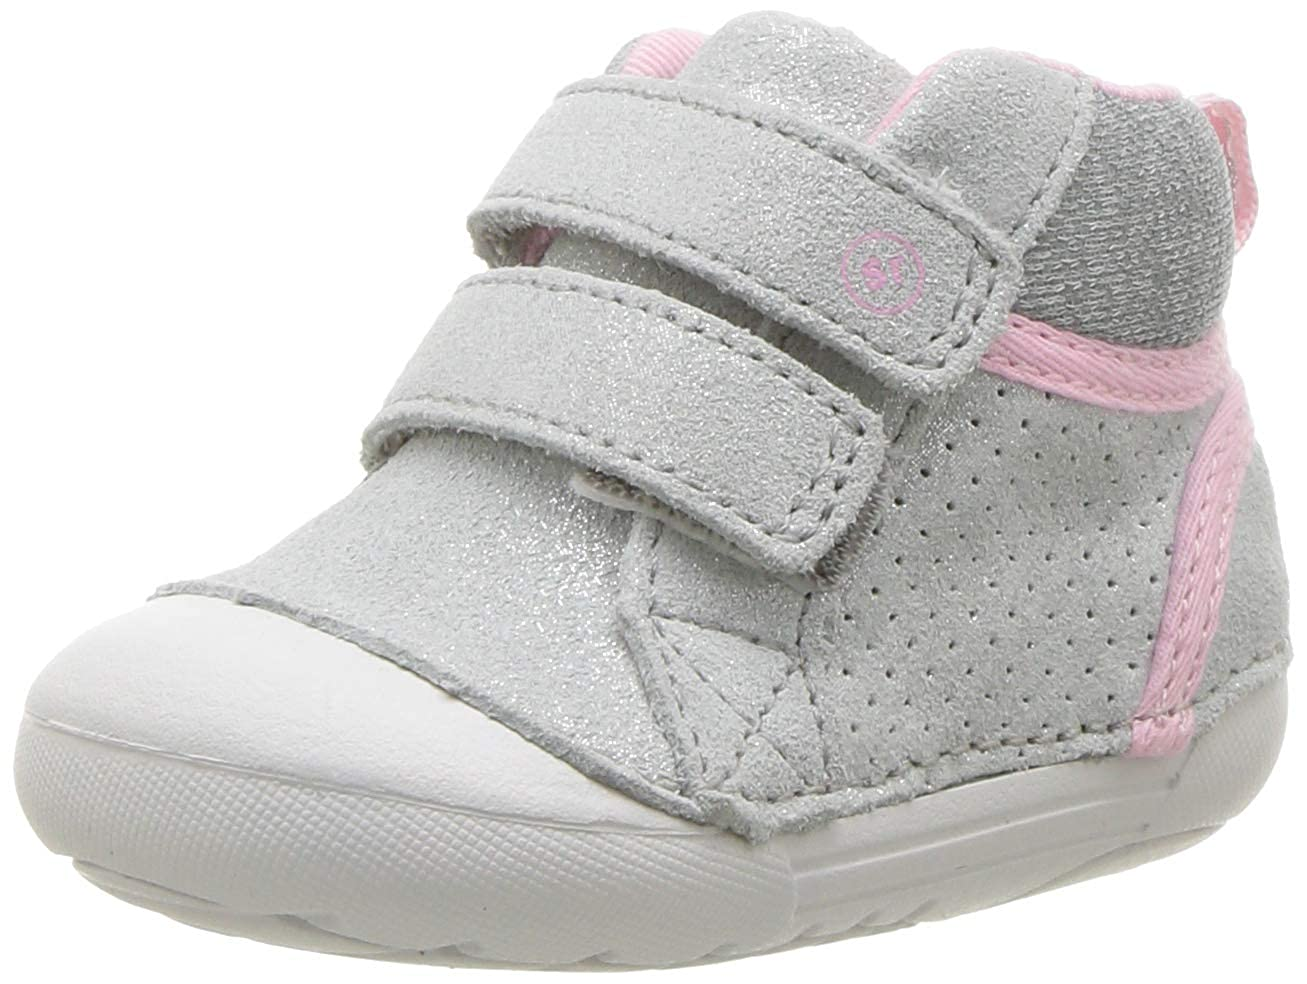 Stride Rite Kids' Sm Milo Sneaker